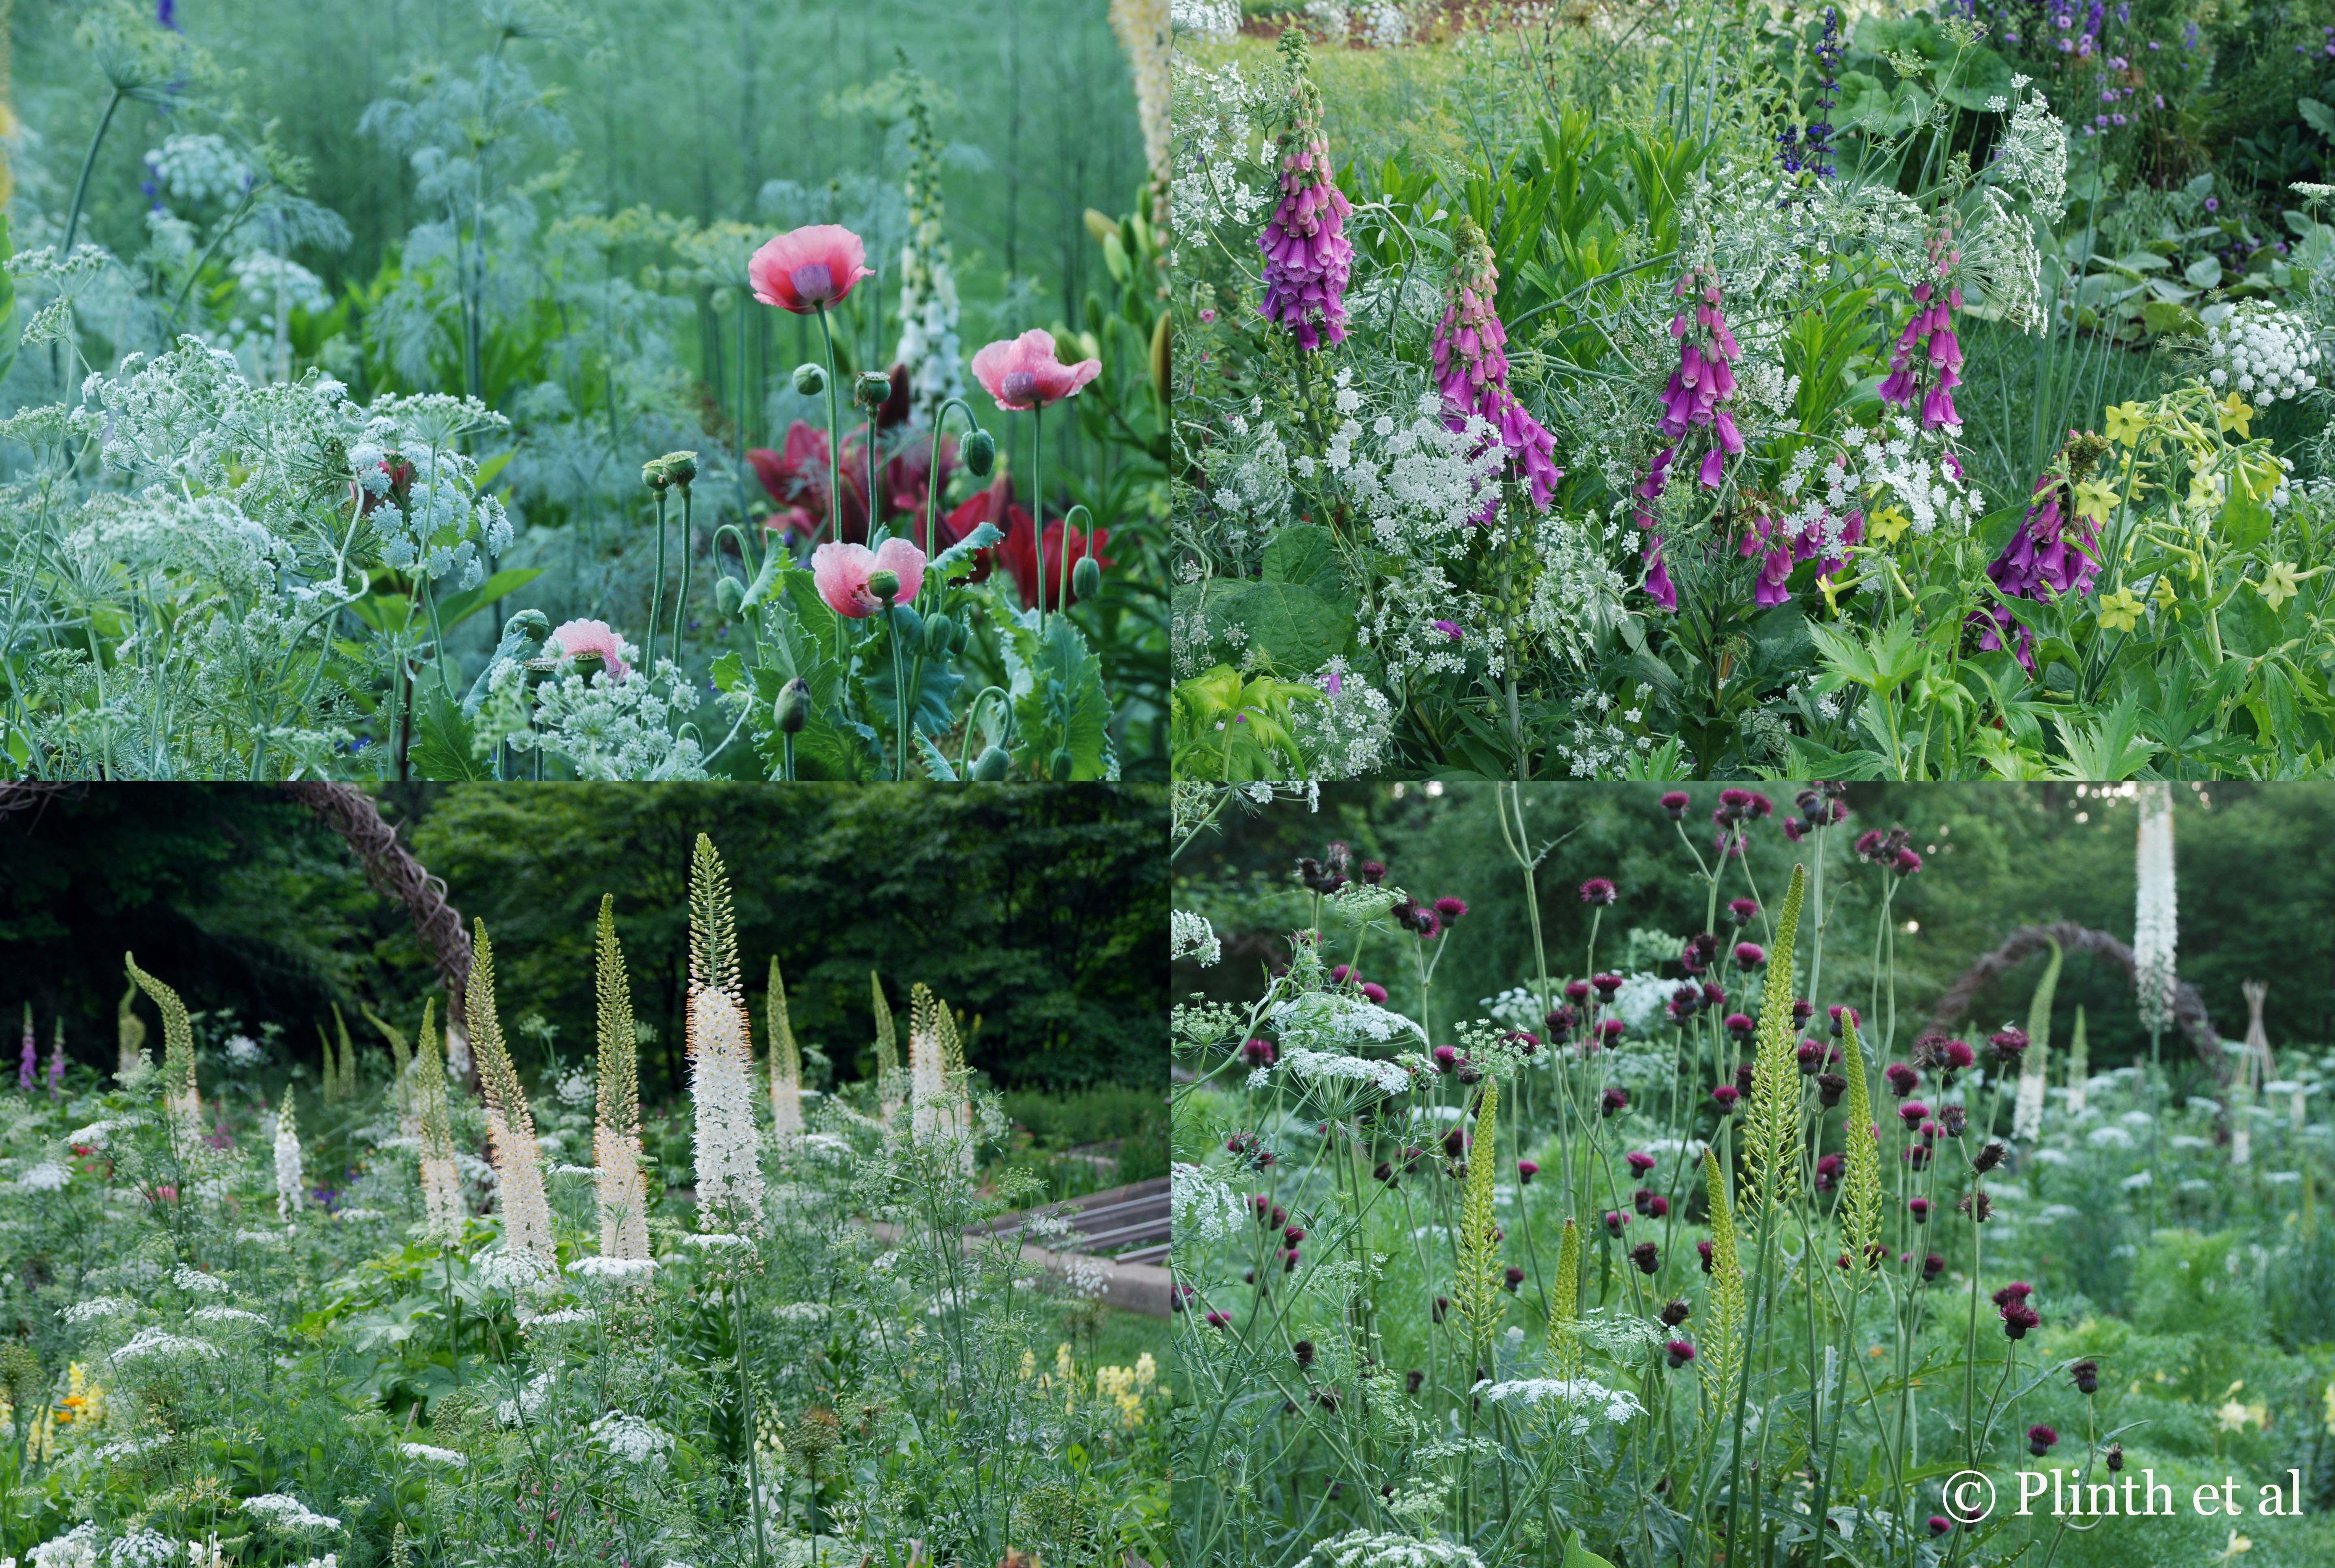 Luxury Ammi majus is a stellar player in different ensembles in the Cut Flower Garden Digitalis purpurea and Nicotiana uLime Green u Eremurus x robustus